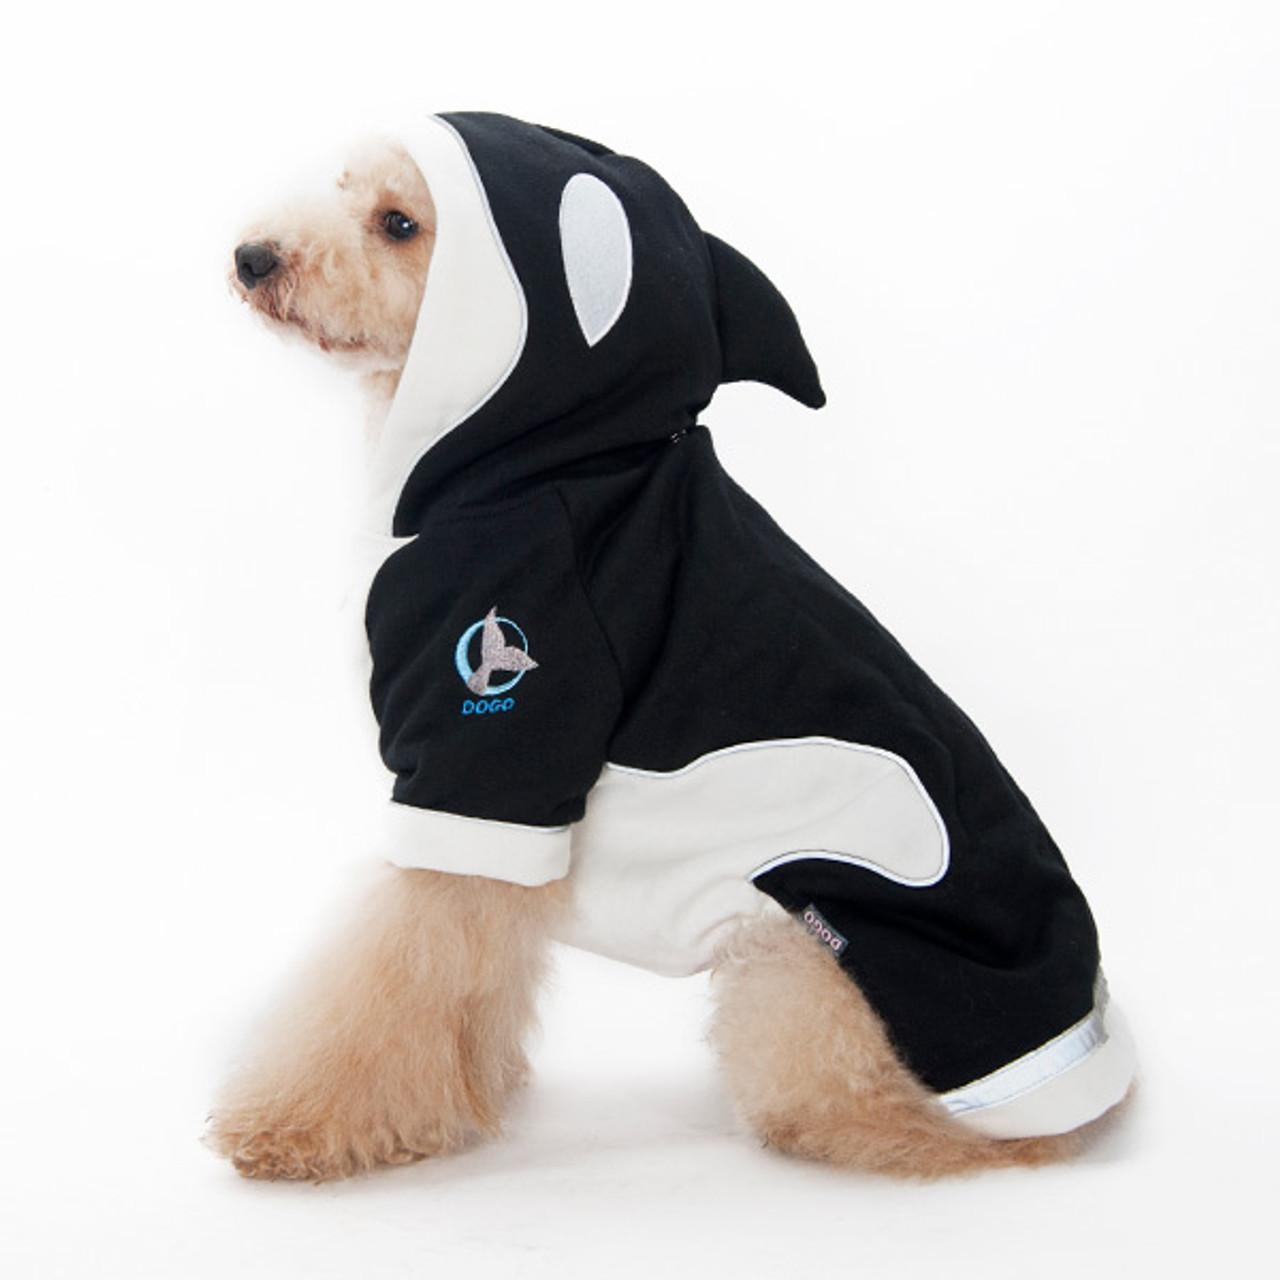 Whales Tie On Pet Bandana